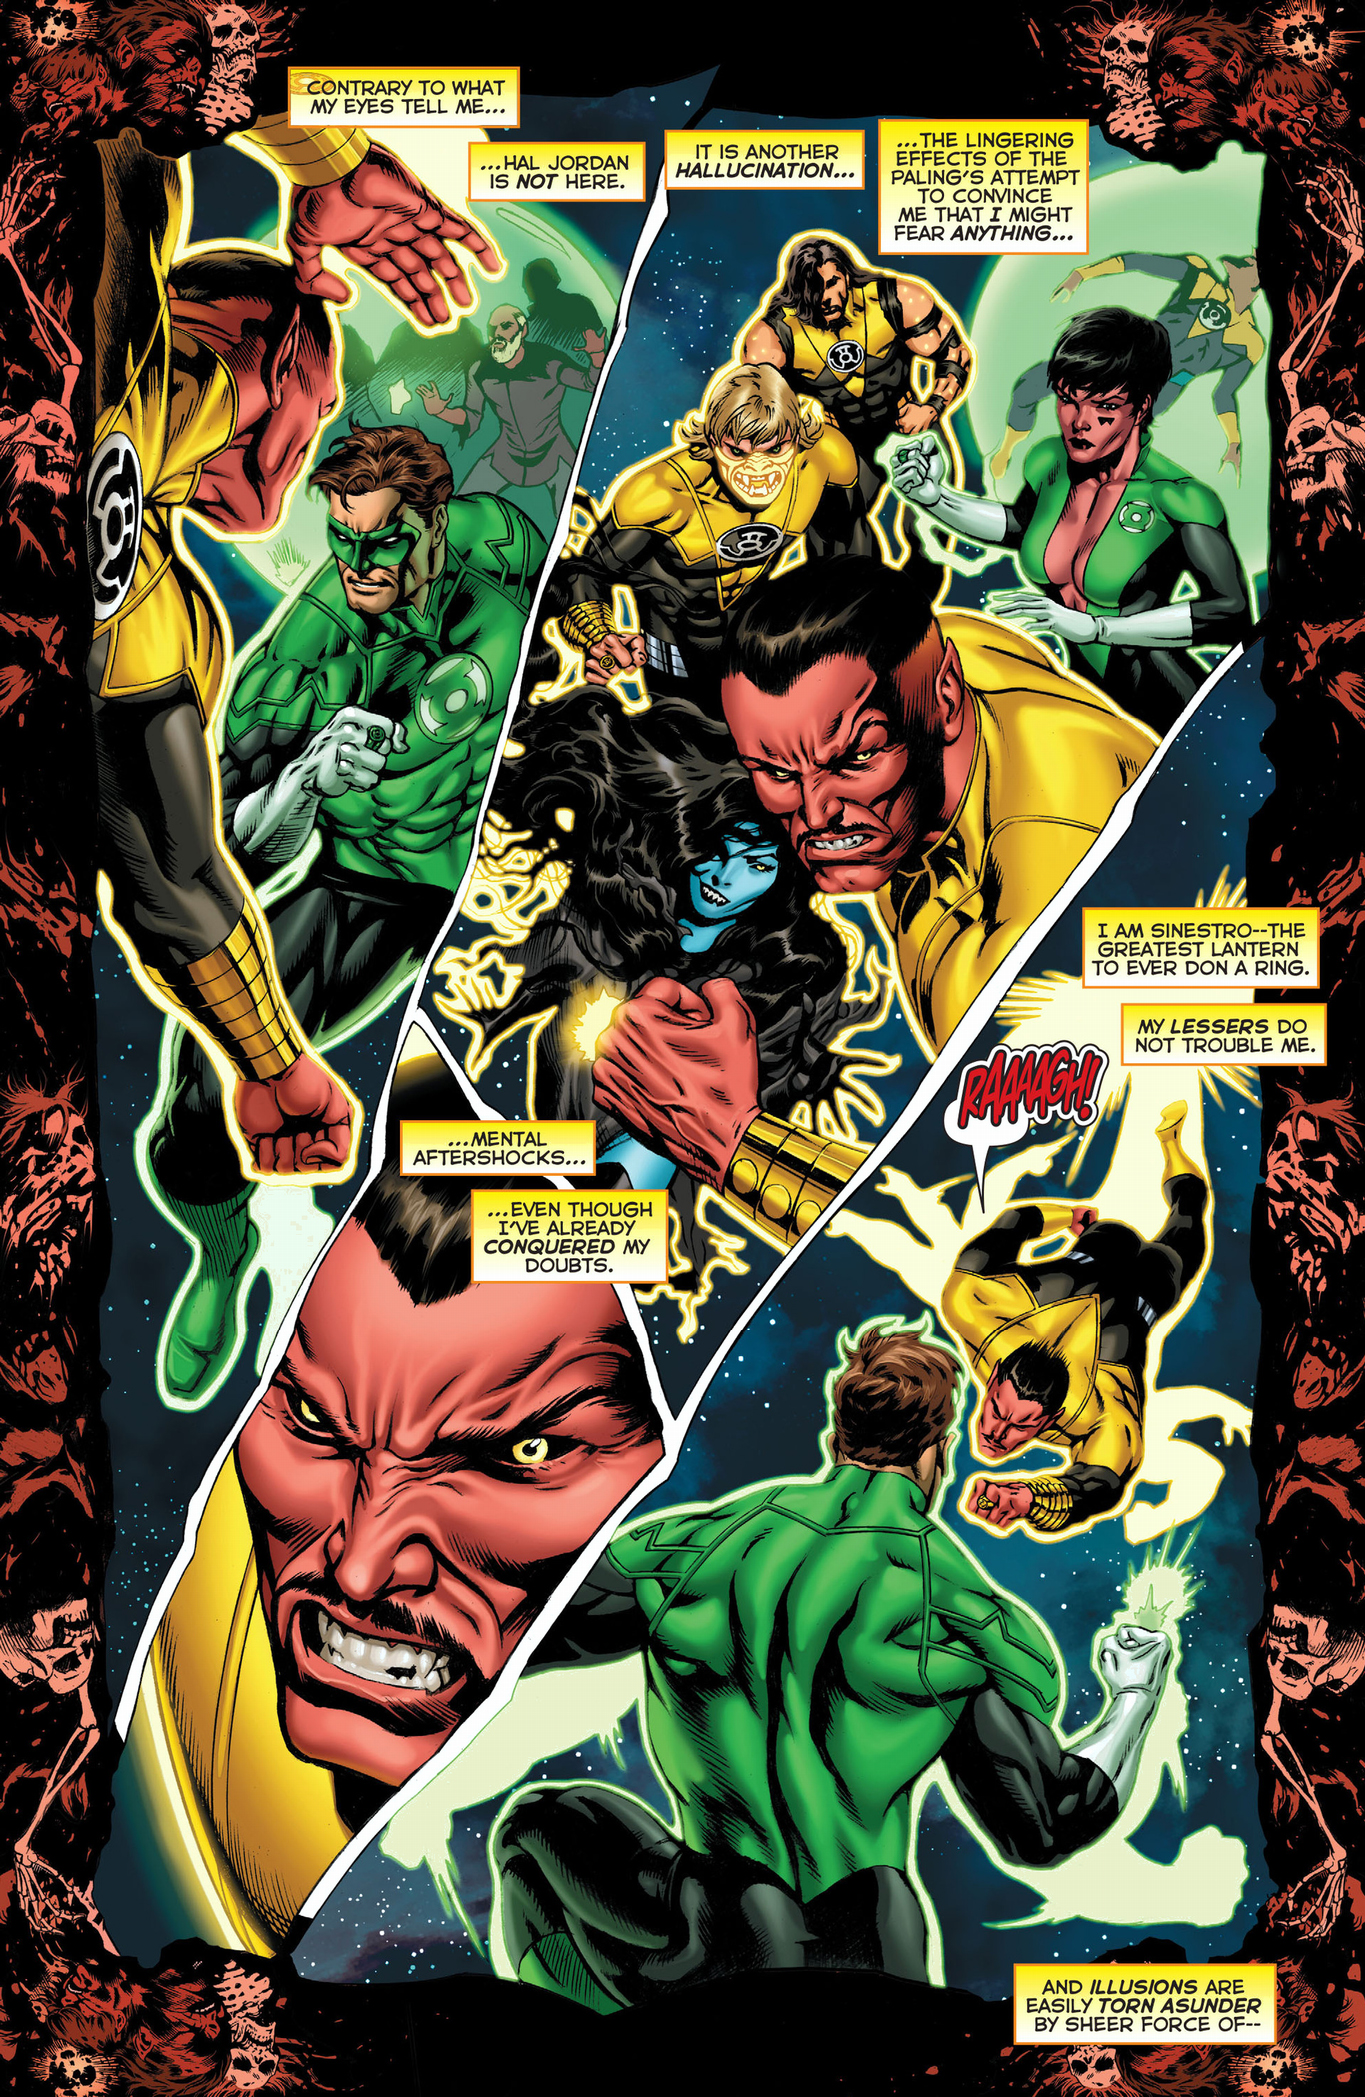 Pierwsze spojrzenie zegarek 100% jakości Green Lantern Hal Jordan VS Sinestro's Elite Guard ...